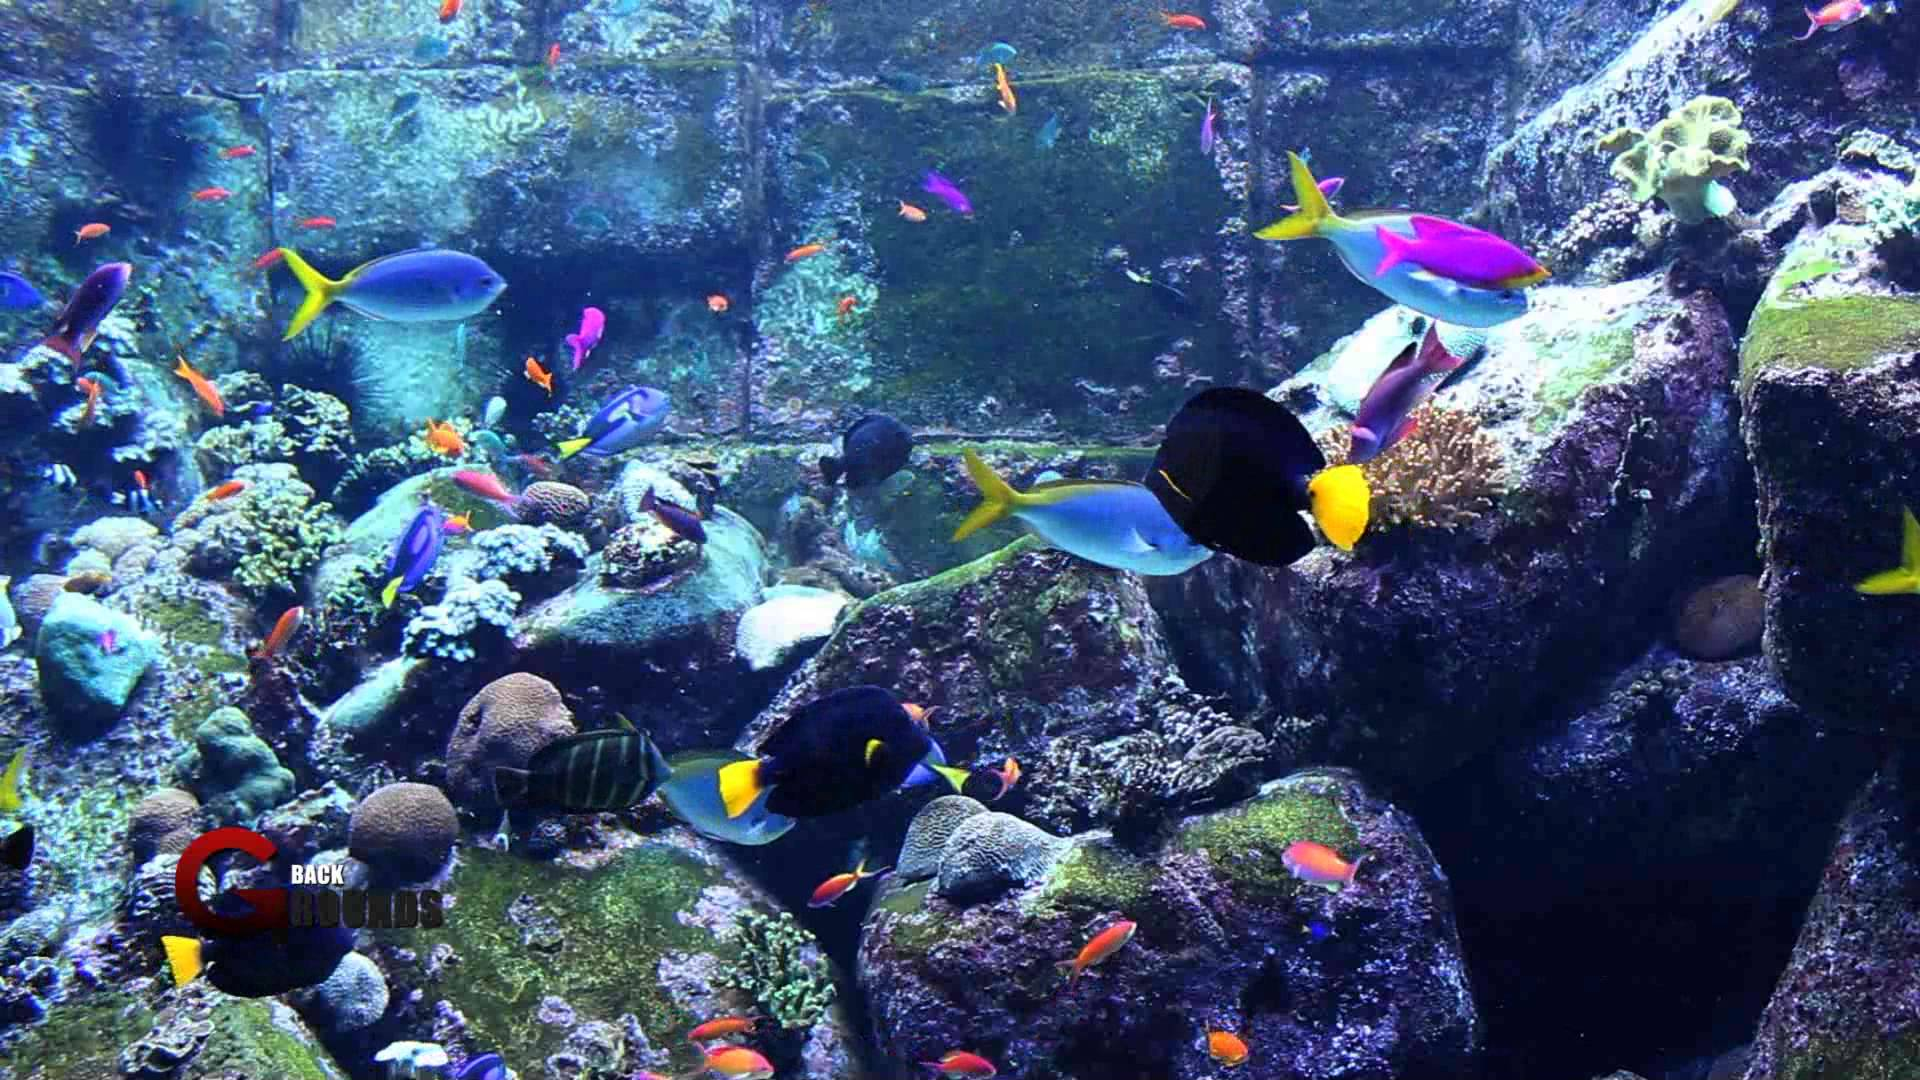 Fish Tank Wallpapers Wallpaper Cave